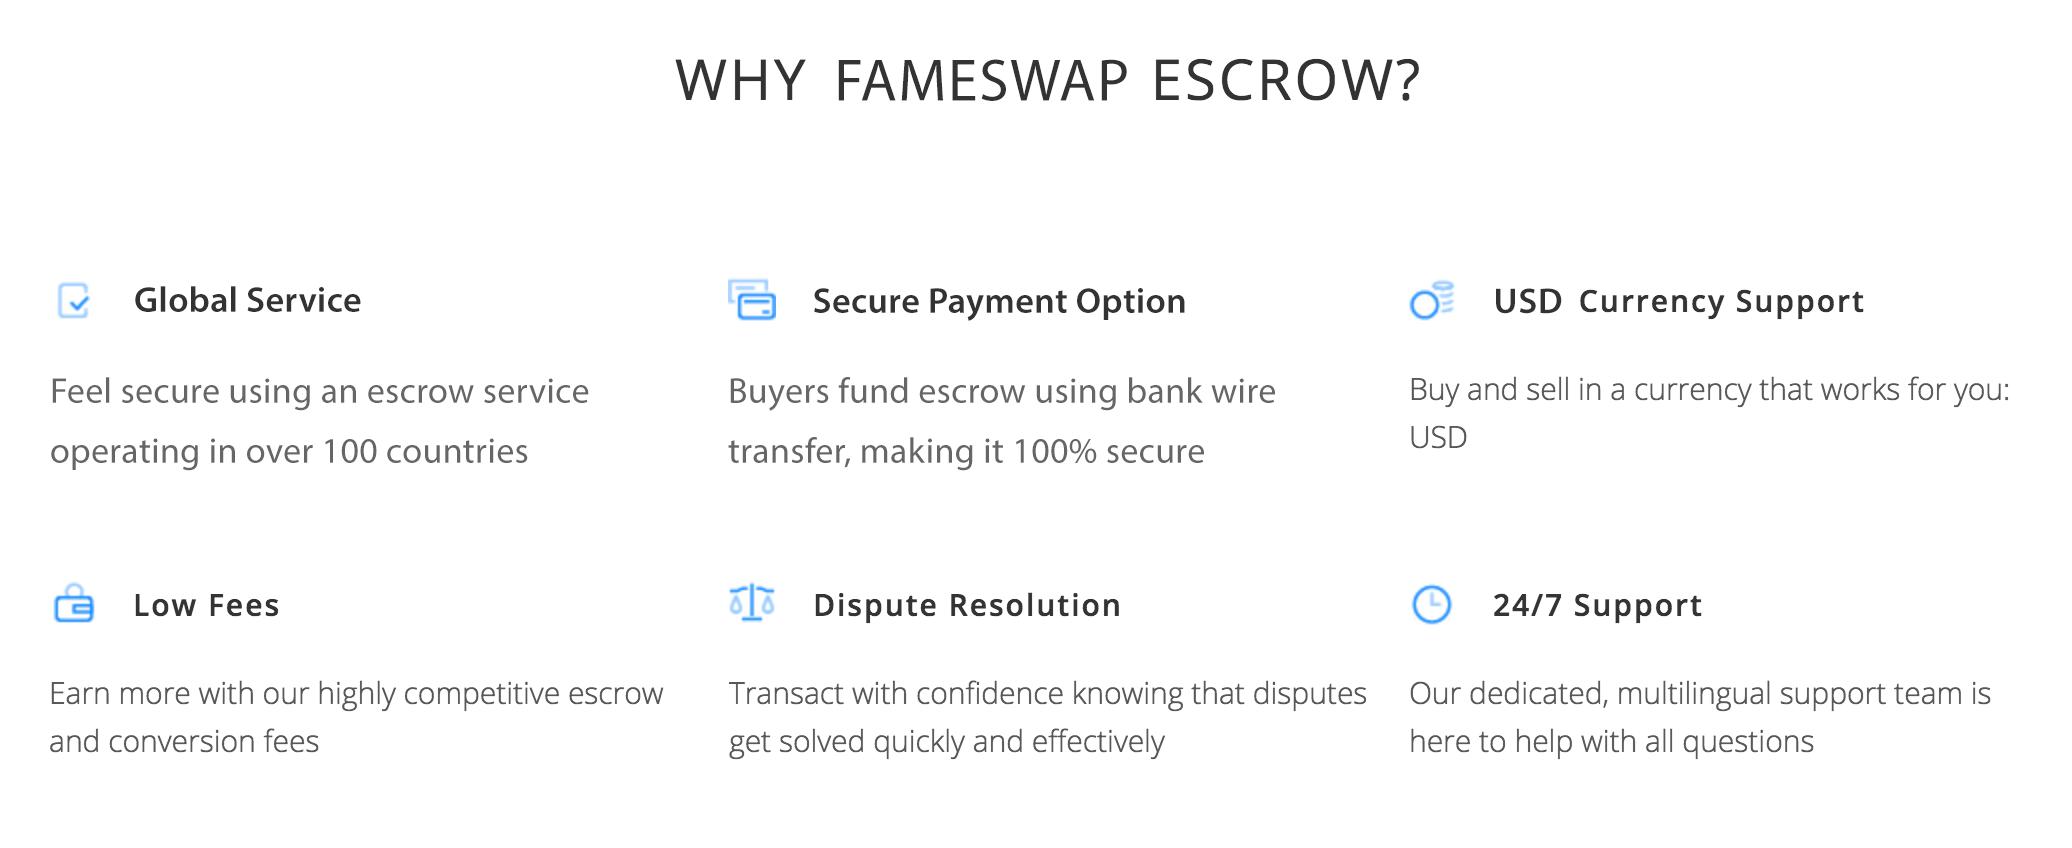 Fameswap Escrow